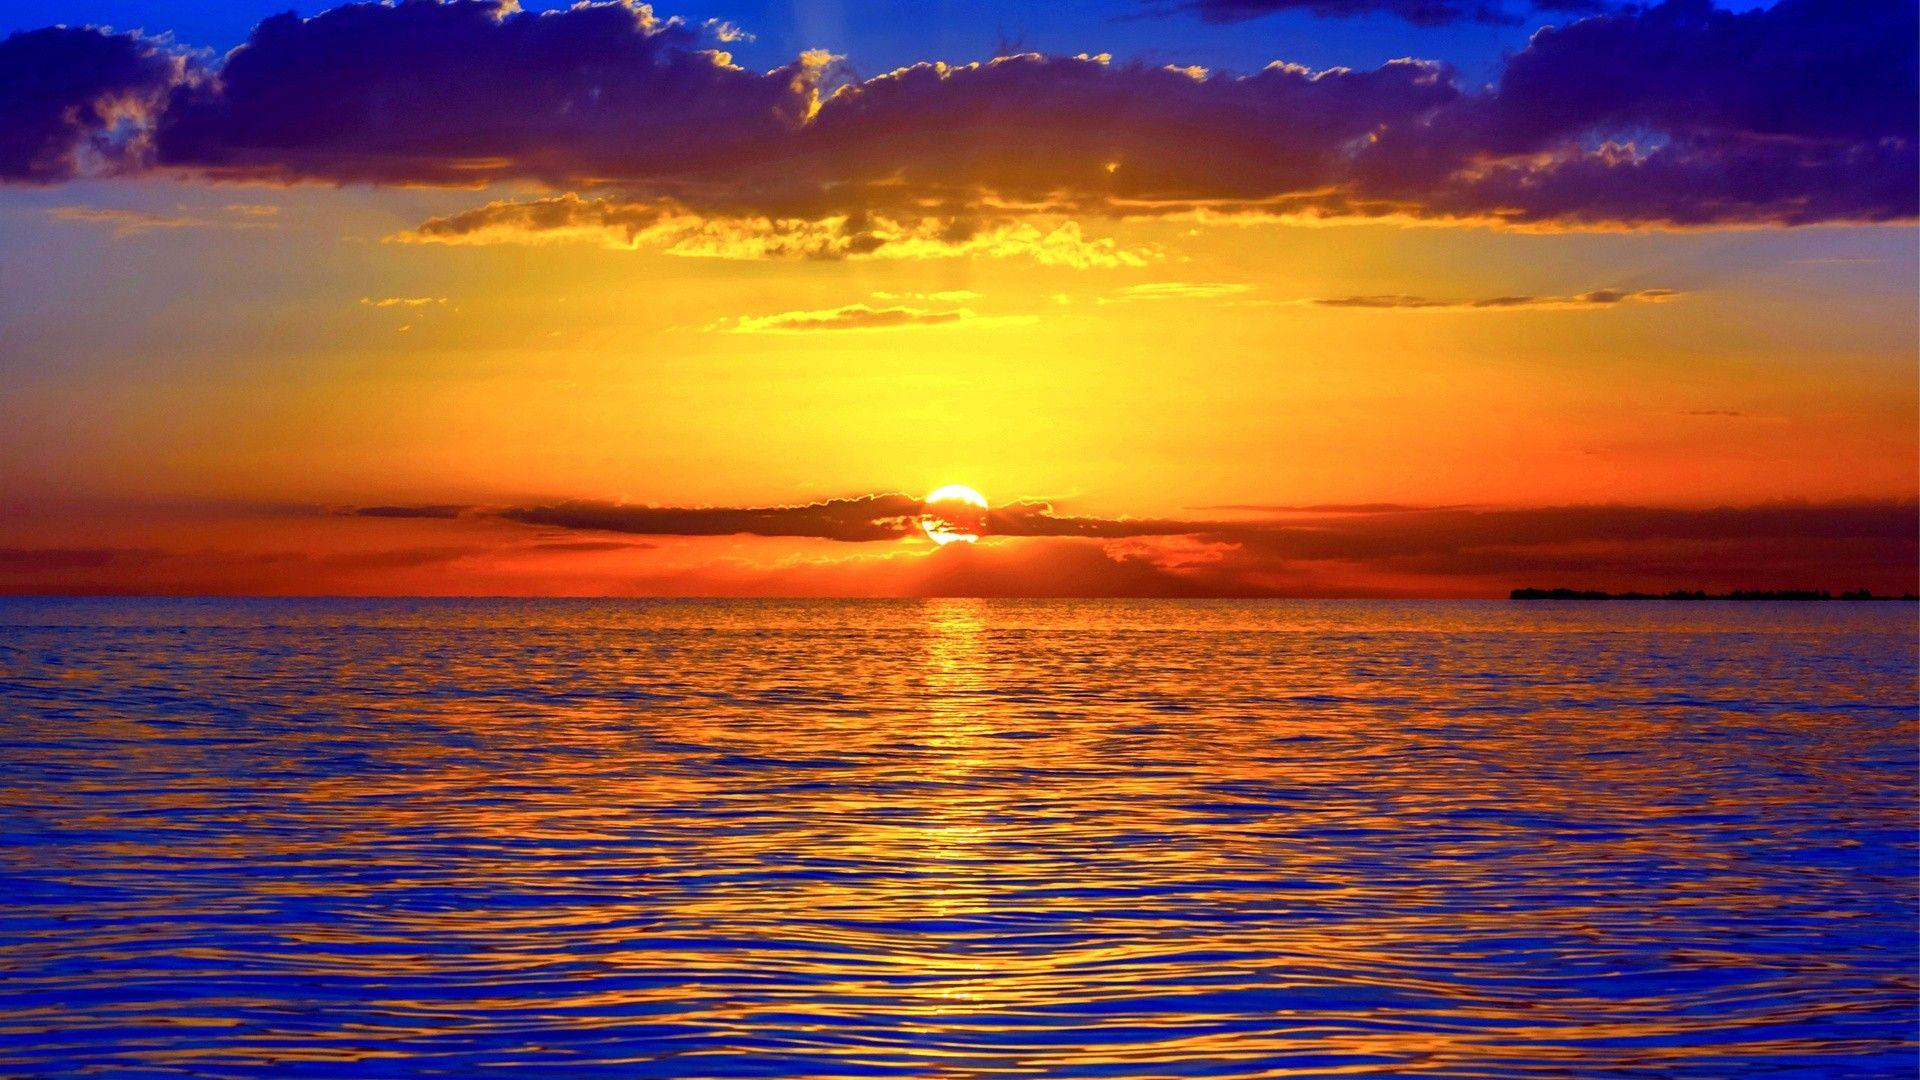 sunset: 23 тис. зображень знайдено в Яндекс.Зображеннях ...